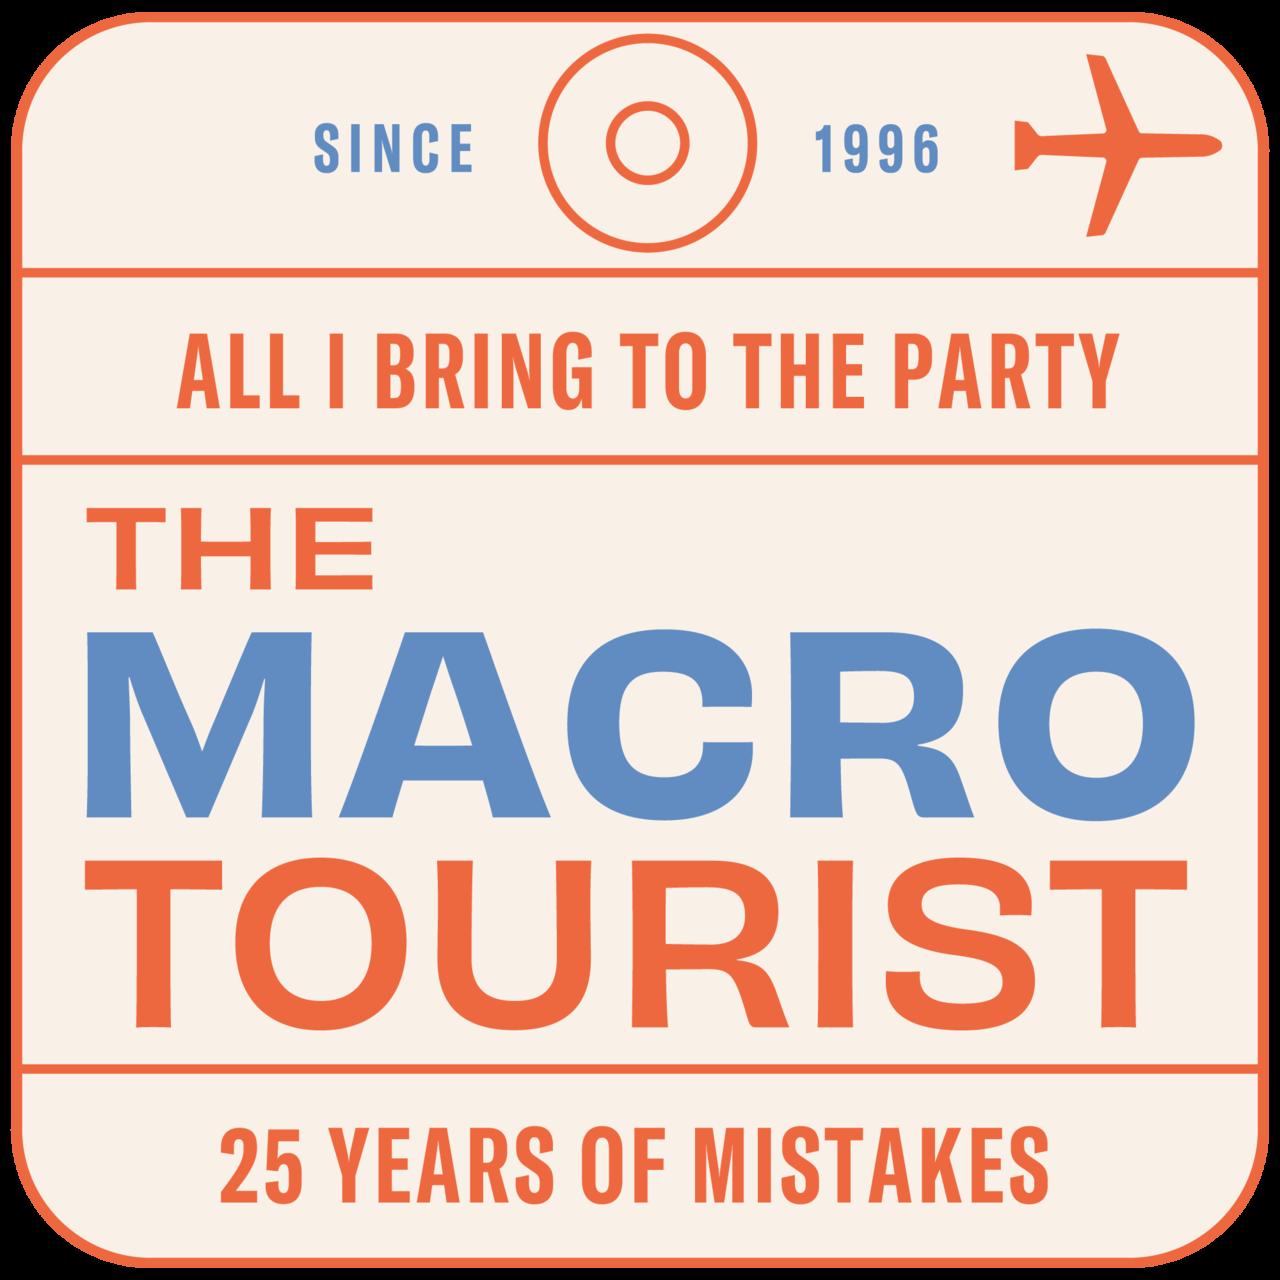 The MacroTourist